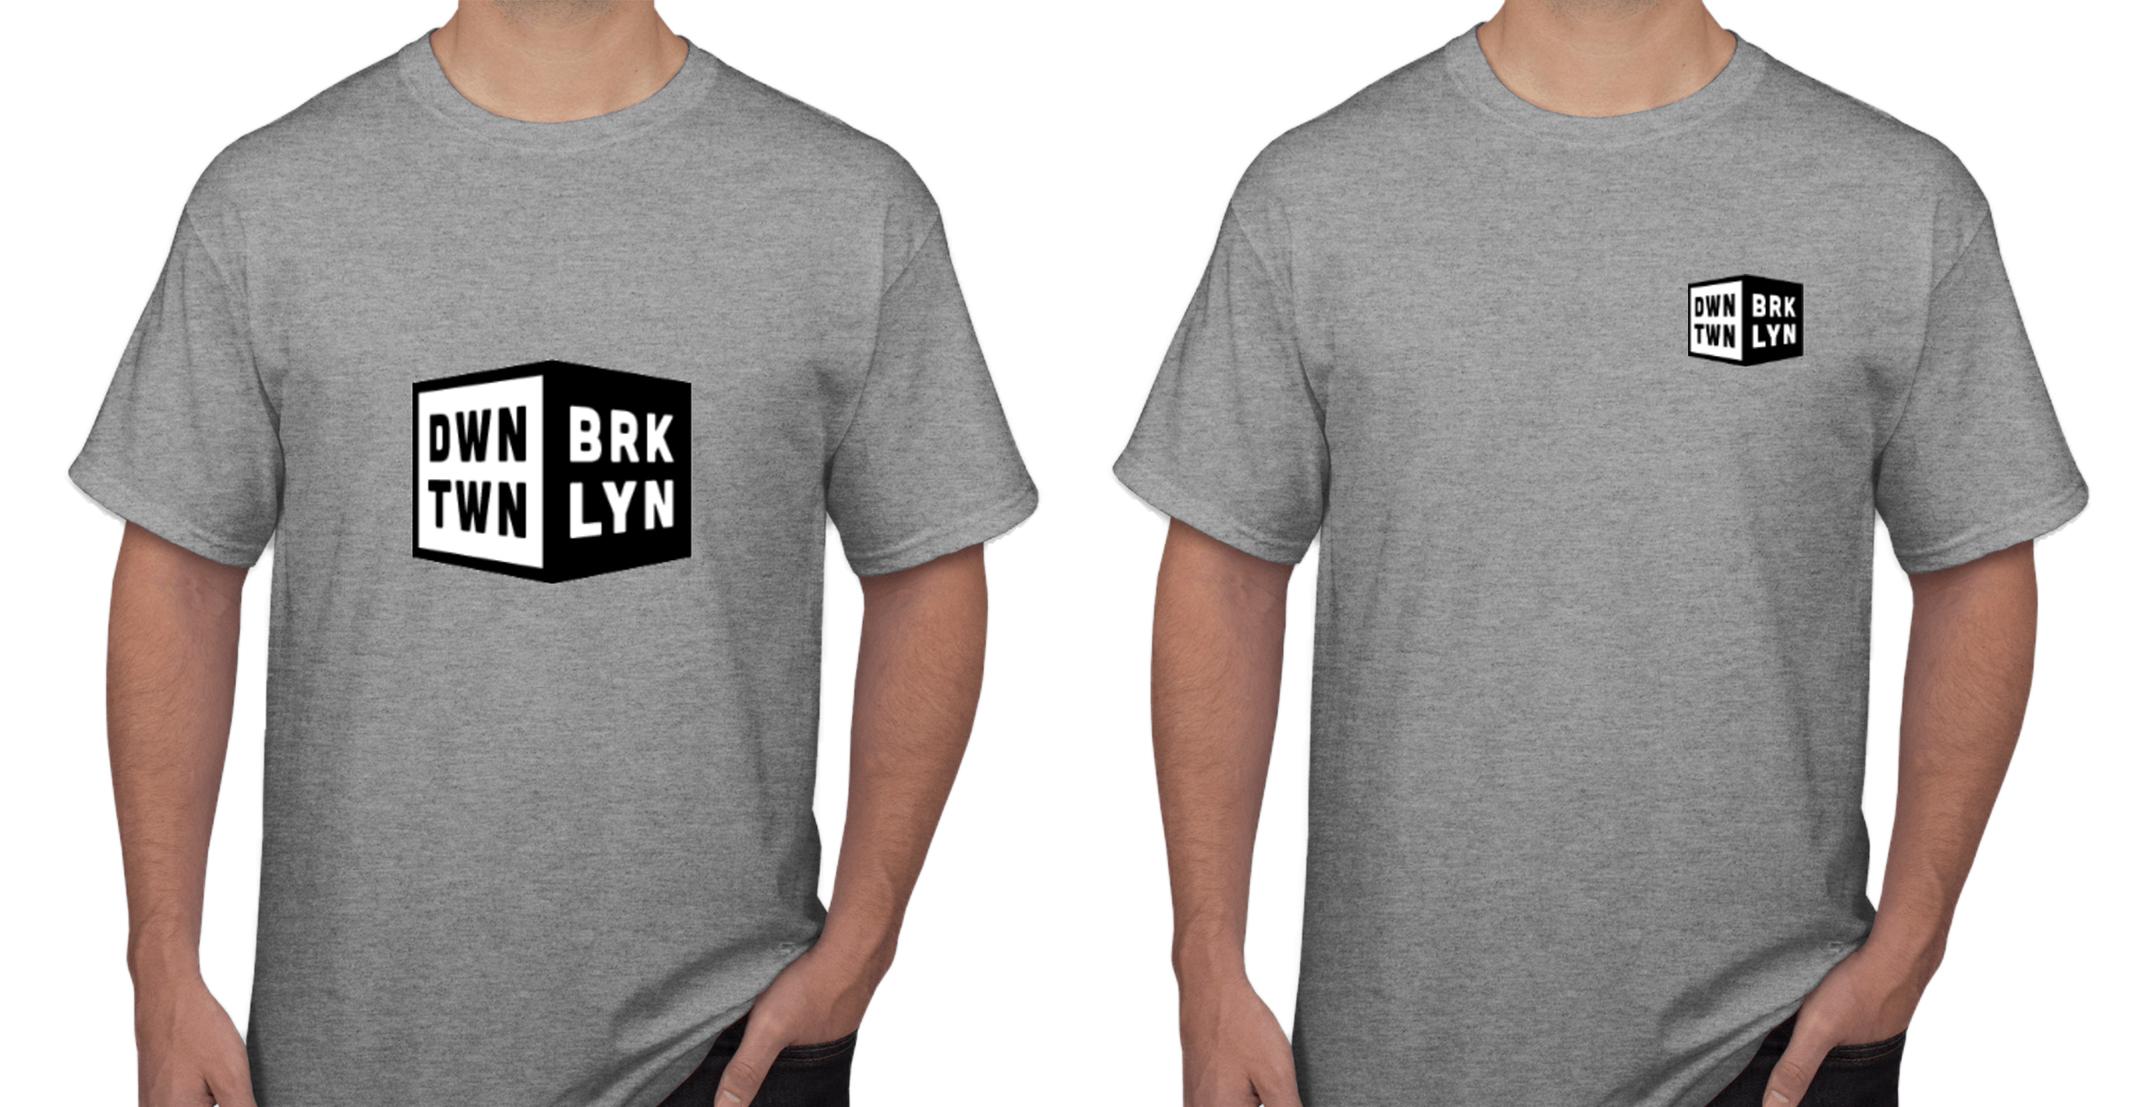 dbp-gray-shirts-onwhite.jpg#asset:16439